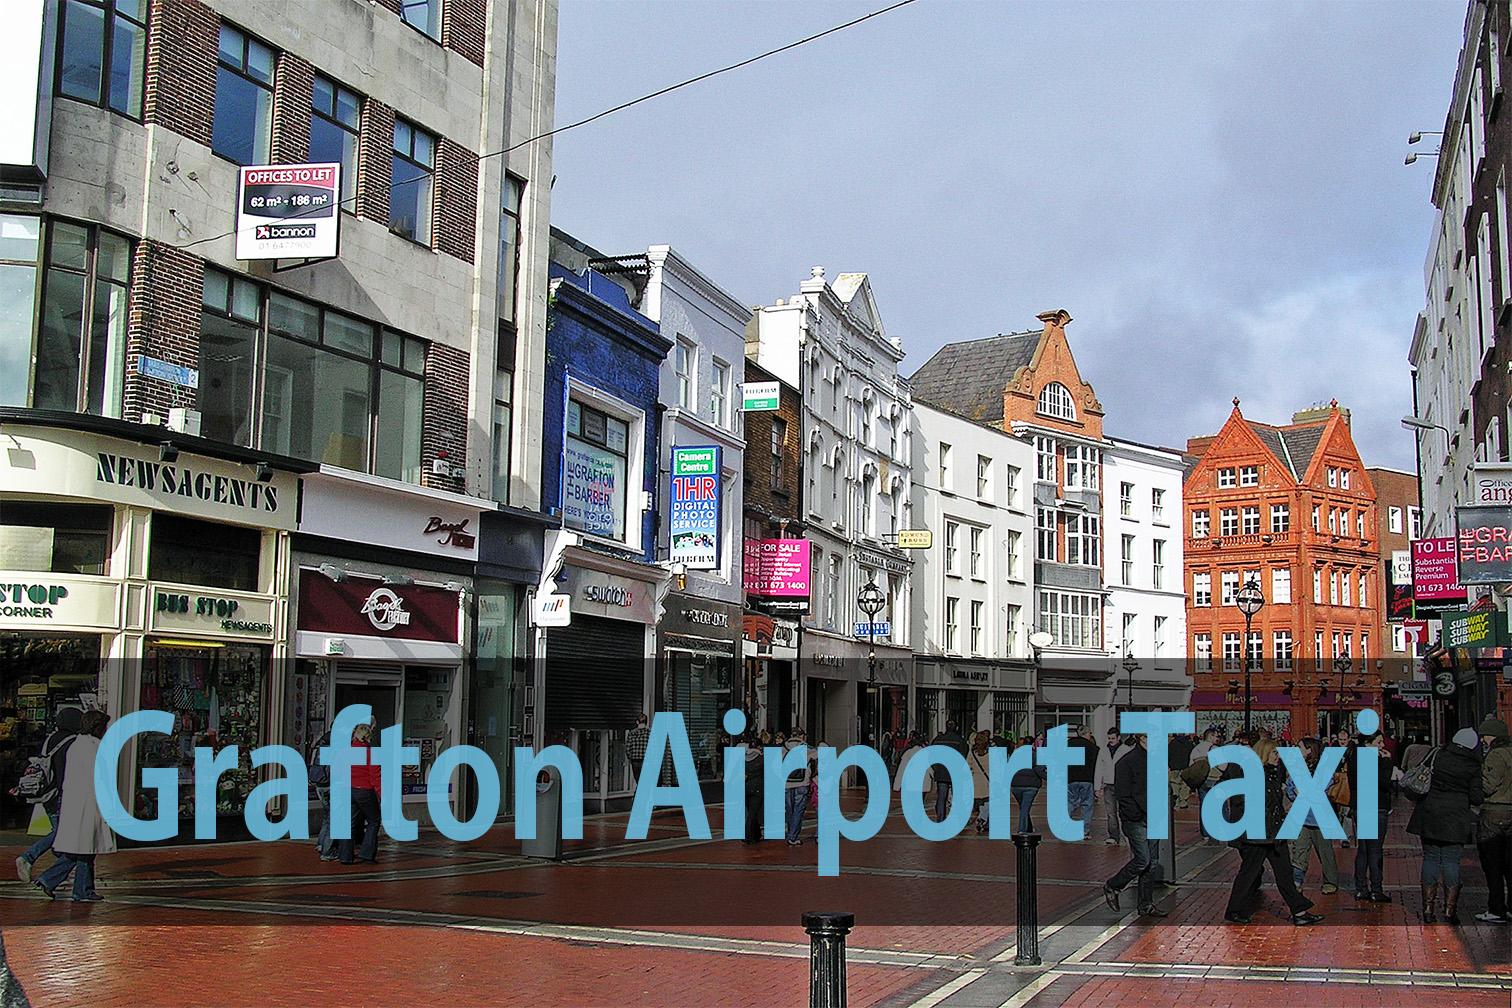 Grafton airport taxi